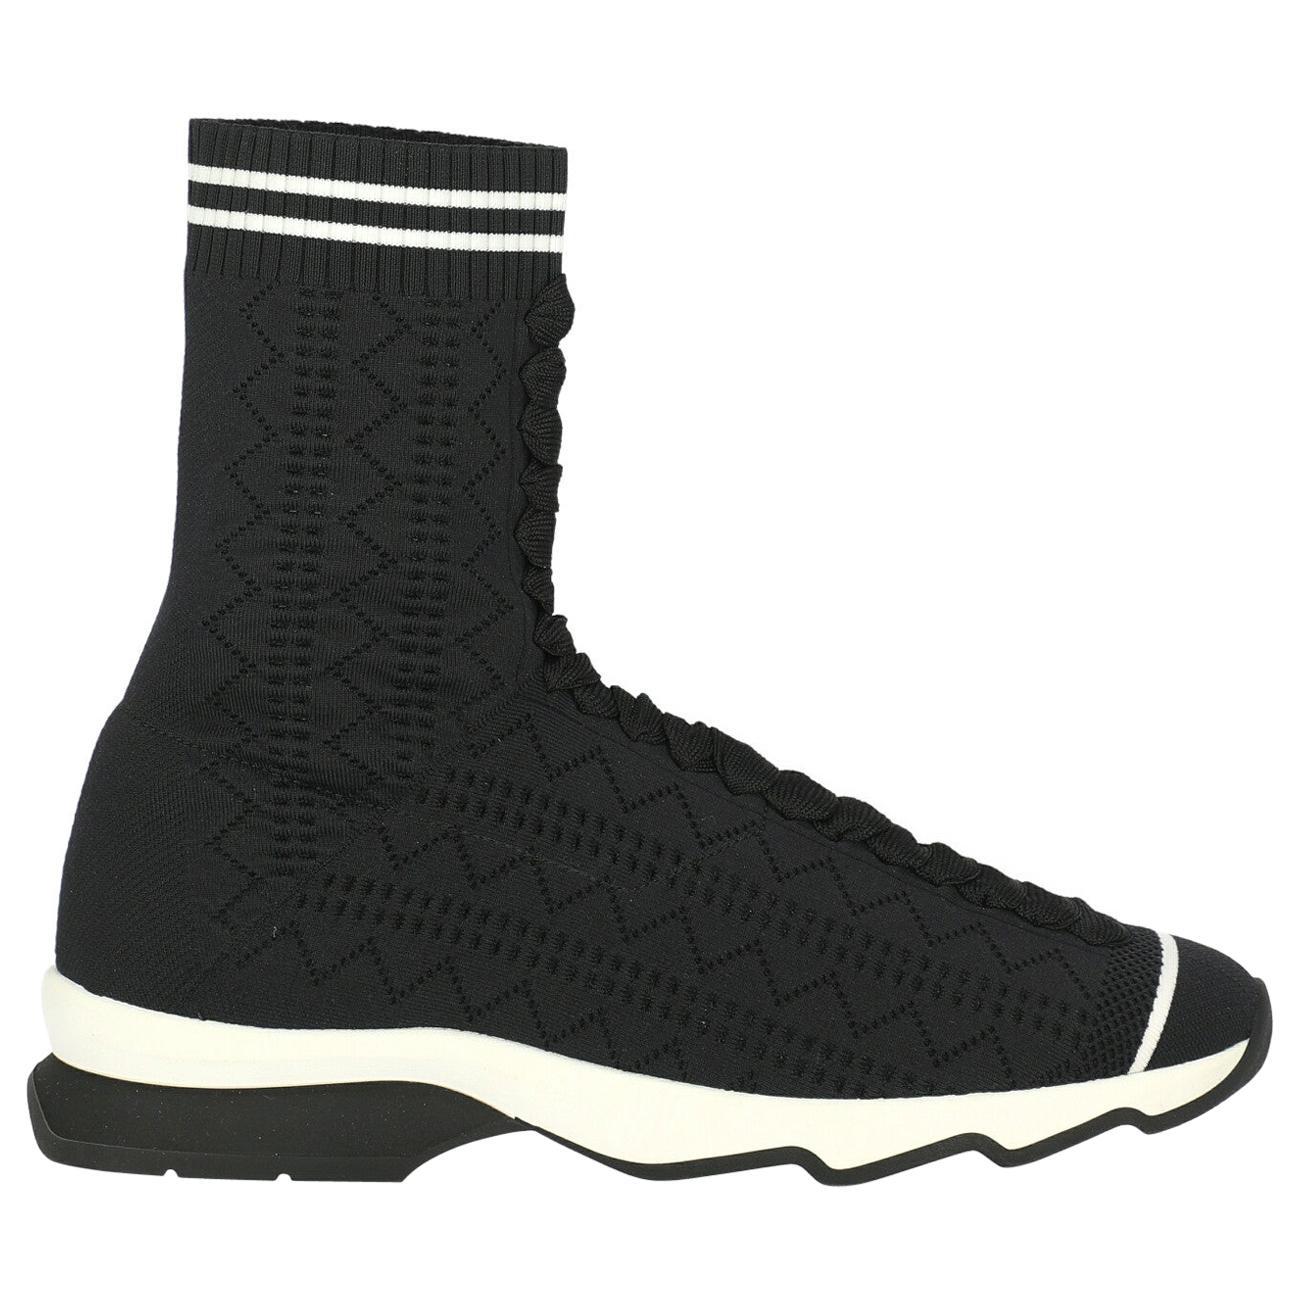 Fendi Woman Sneakers Black Fabric IT 39